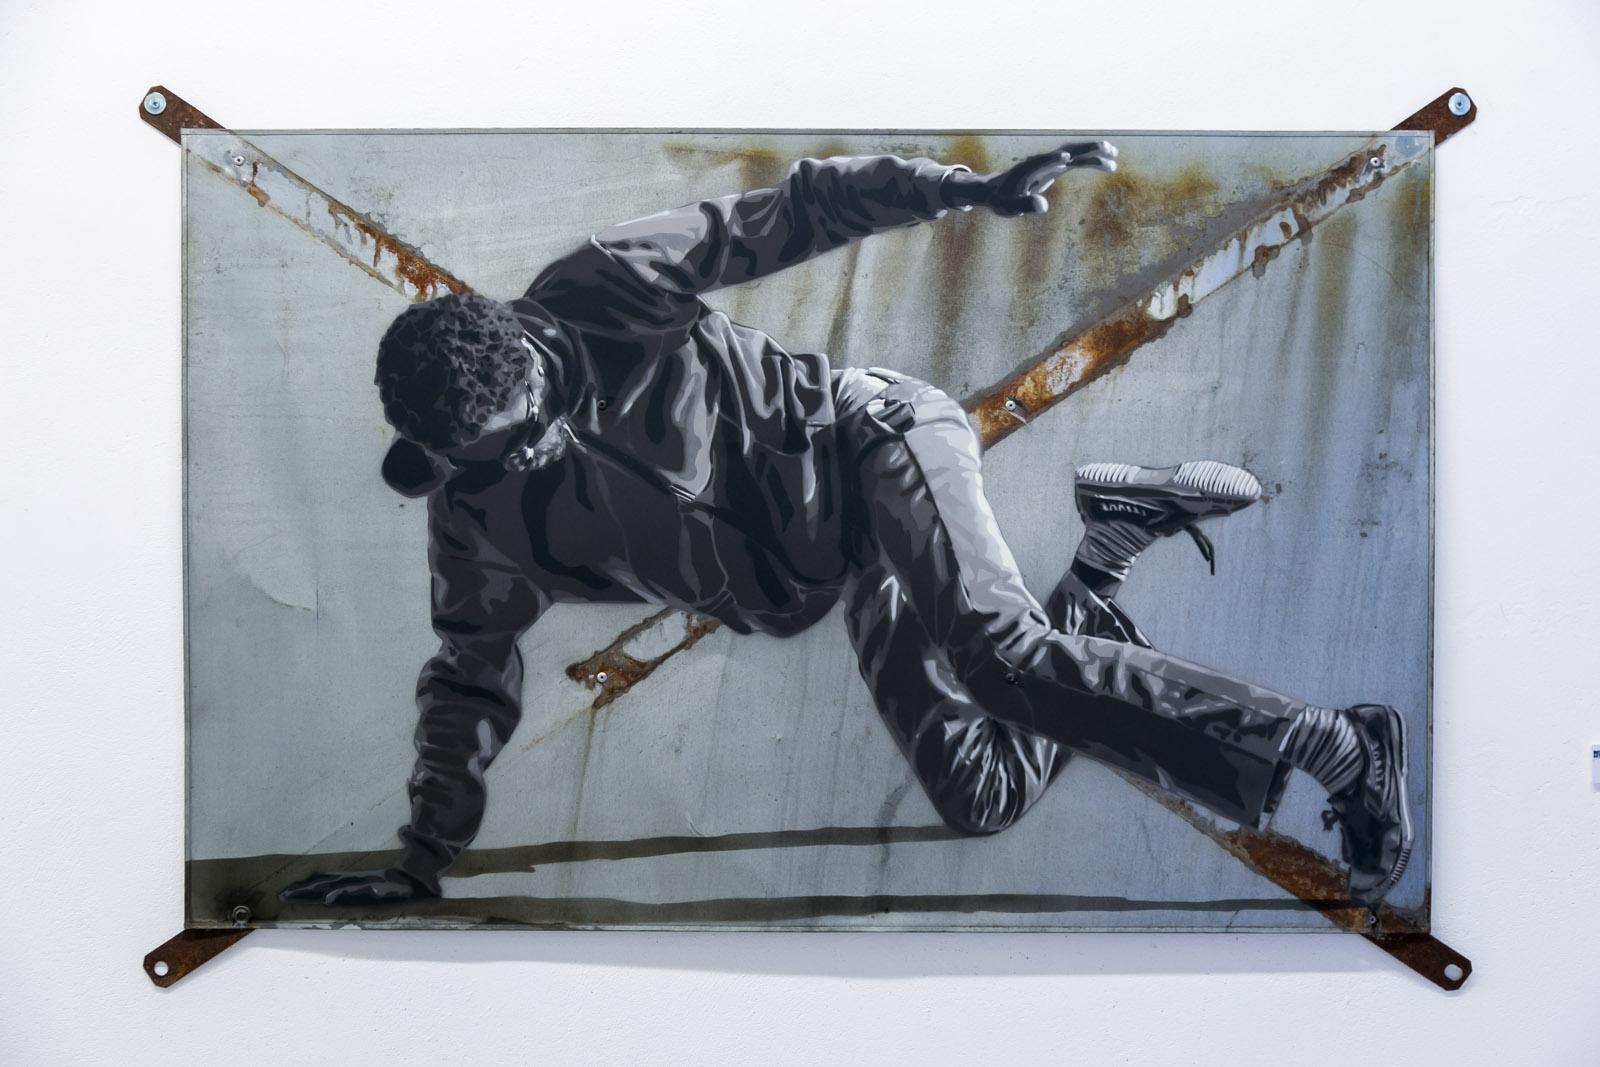 Anders Gjennestad à la galerie Mathgoth - Juin 2016